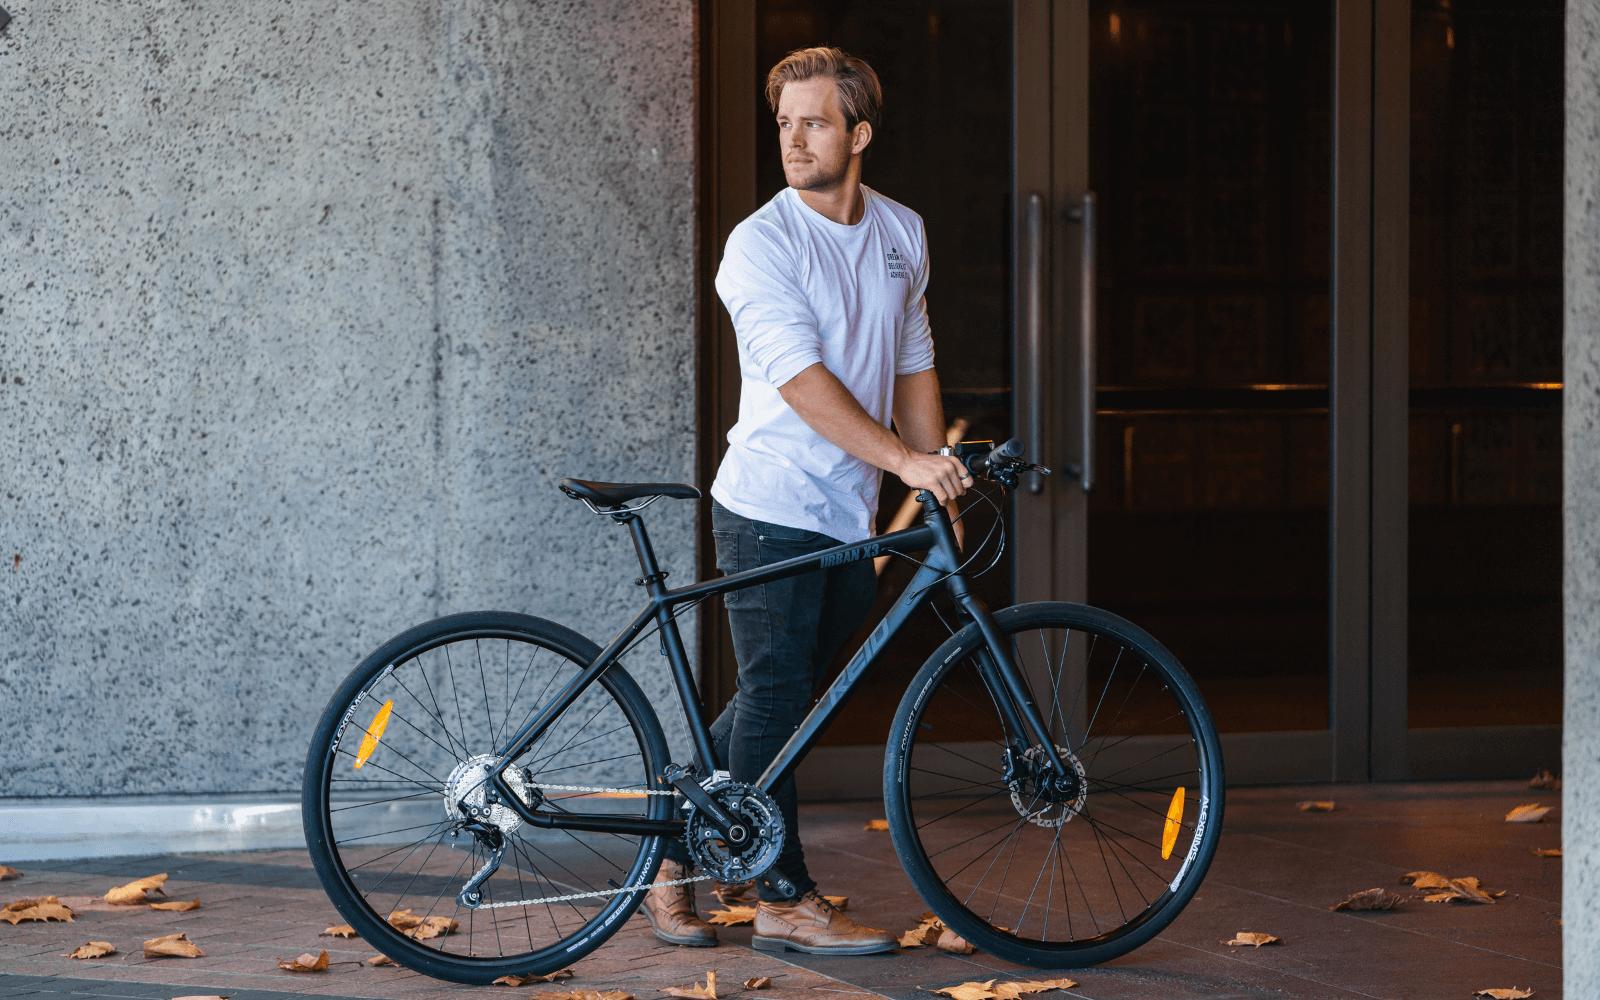 90 2 - Reid ® - Urban X3 Bike